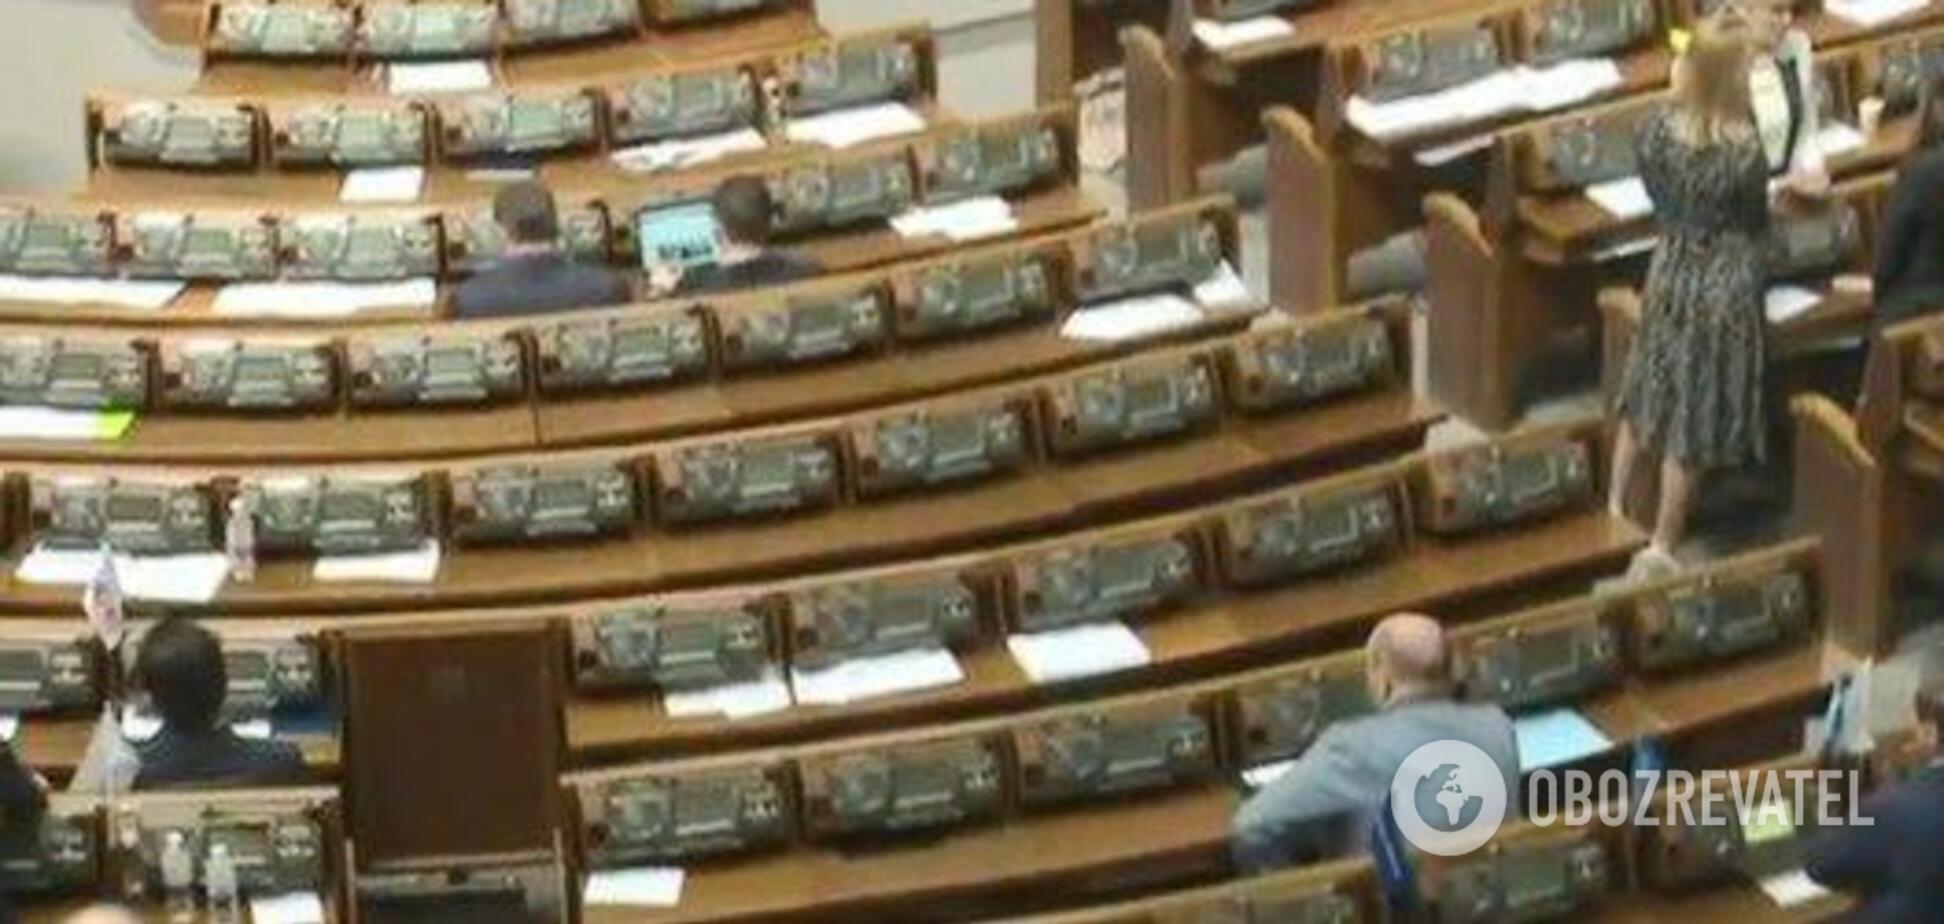 'Не Рада, а зрада!' Нардепи викликали гнів українців: у чому справа. Фотофакт